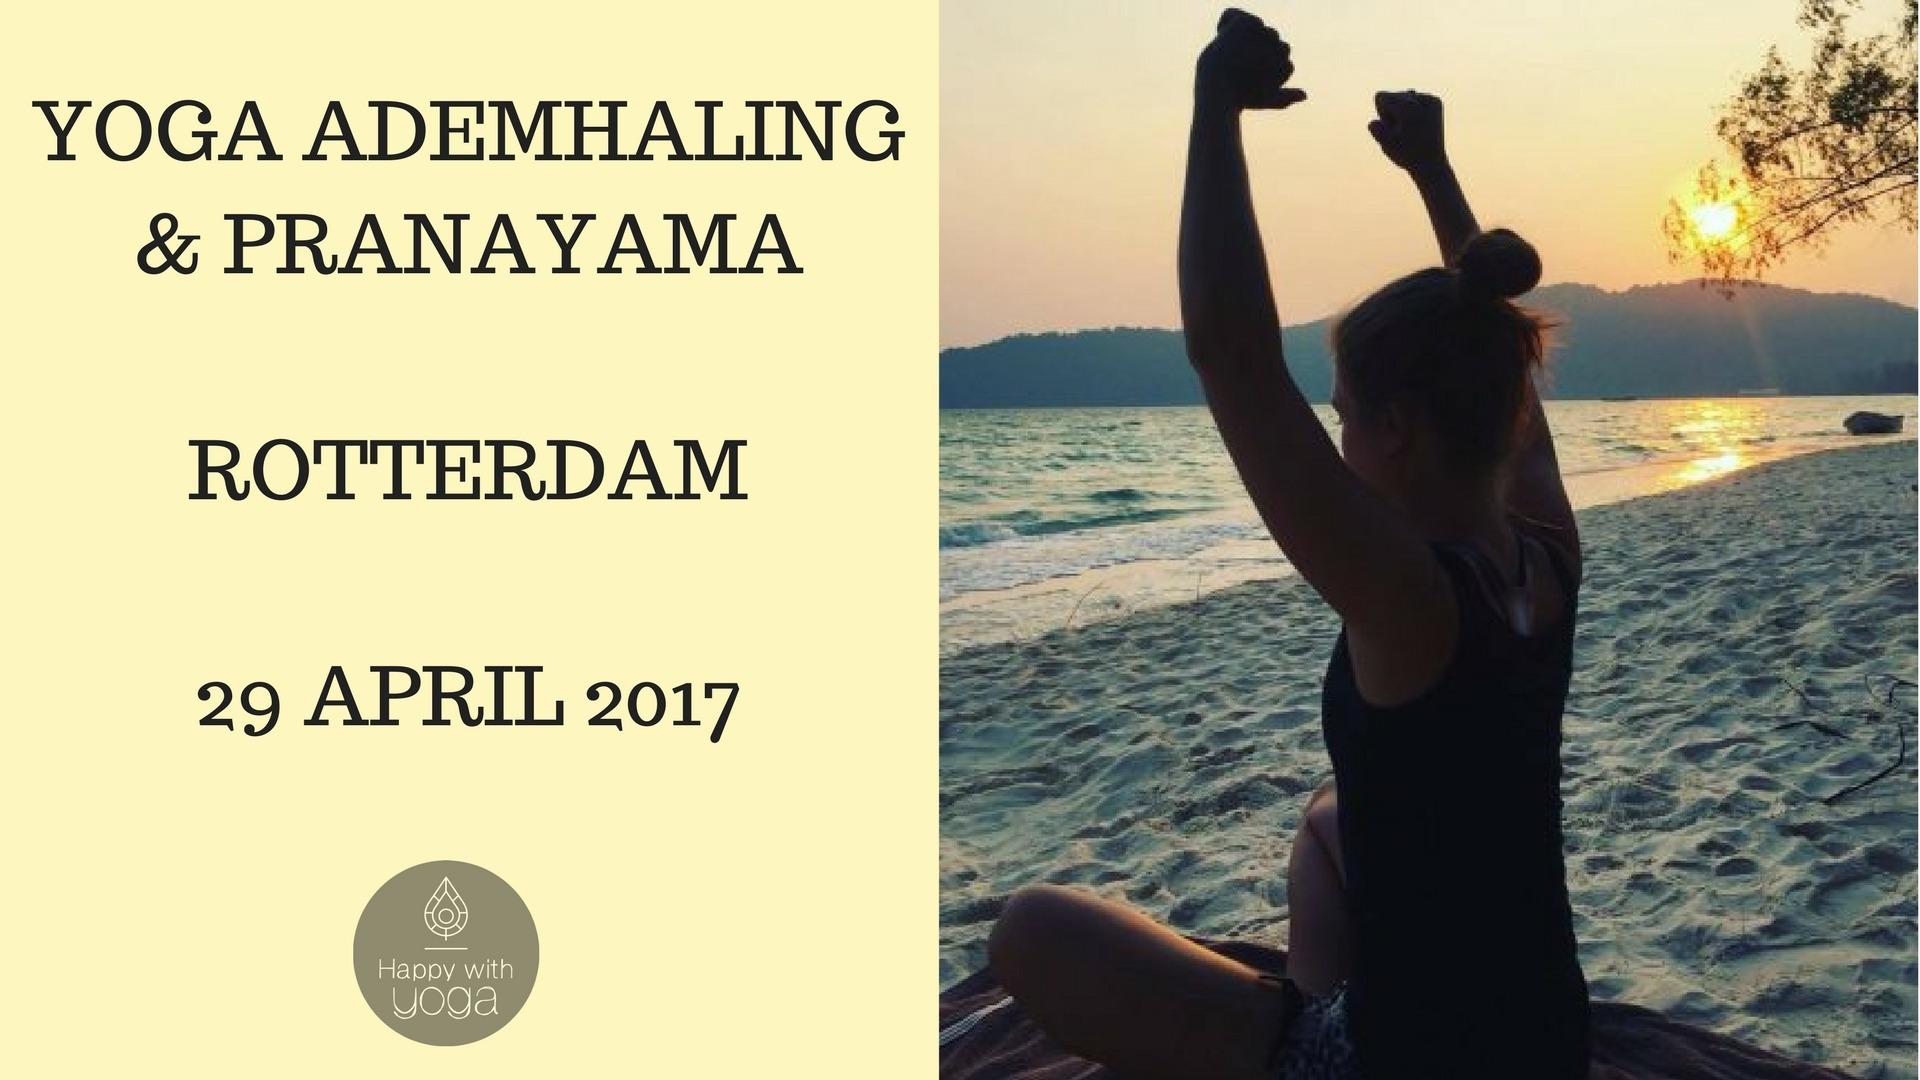 Yoga ademhaling workshop